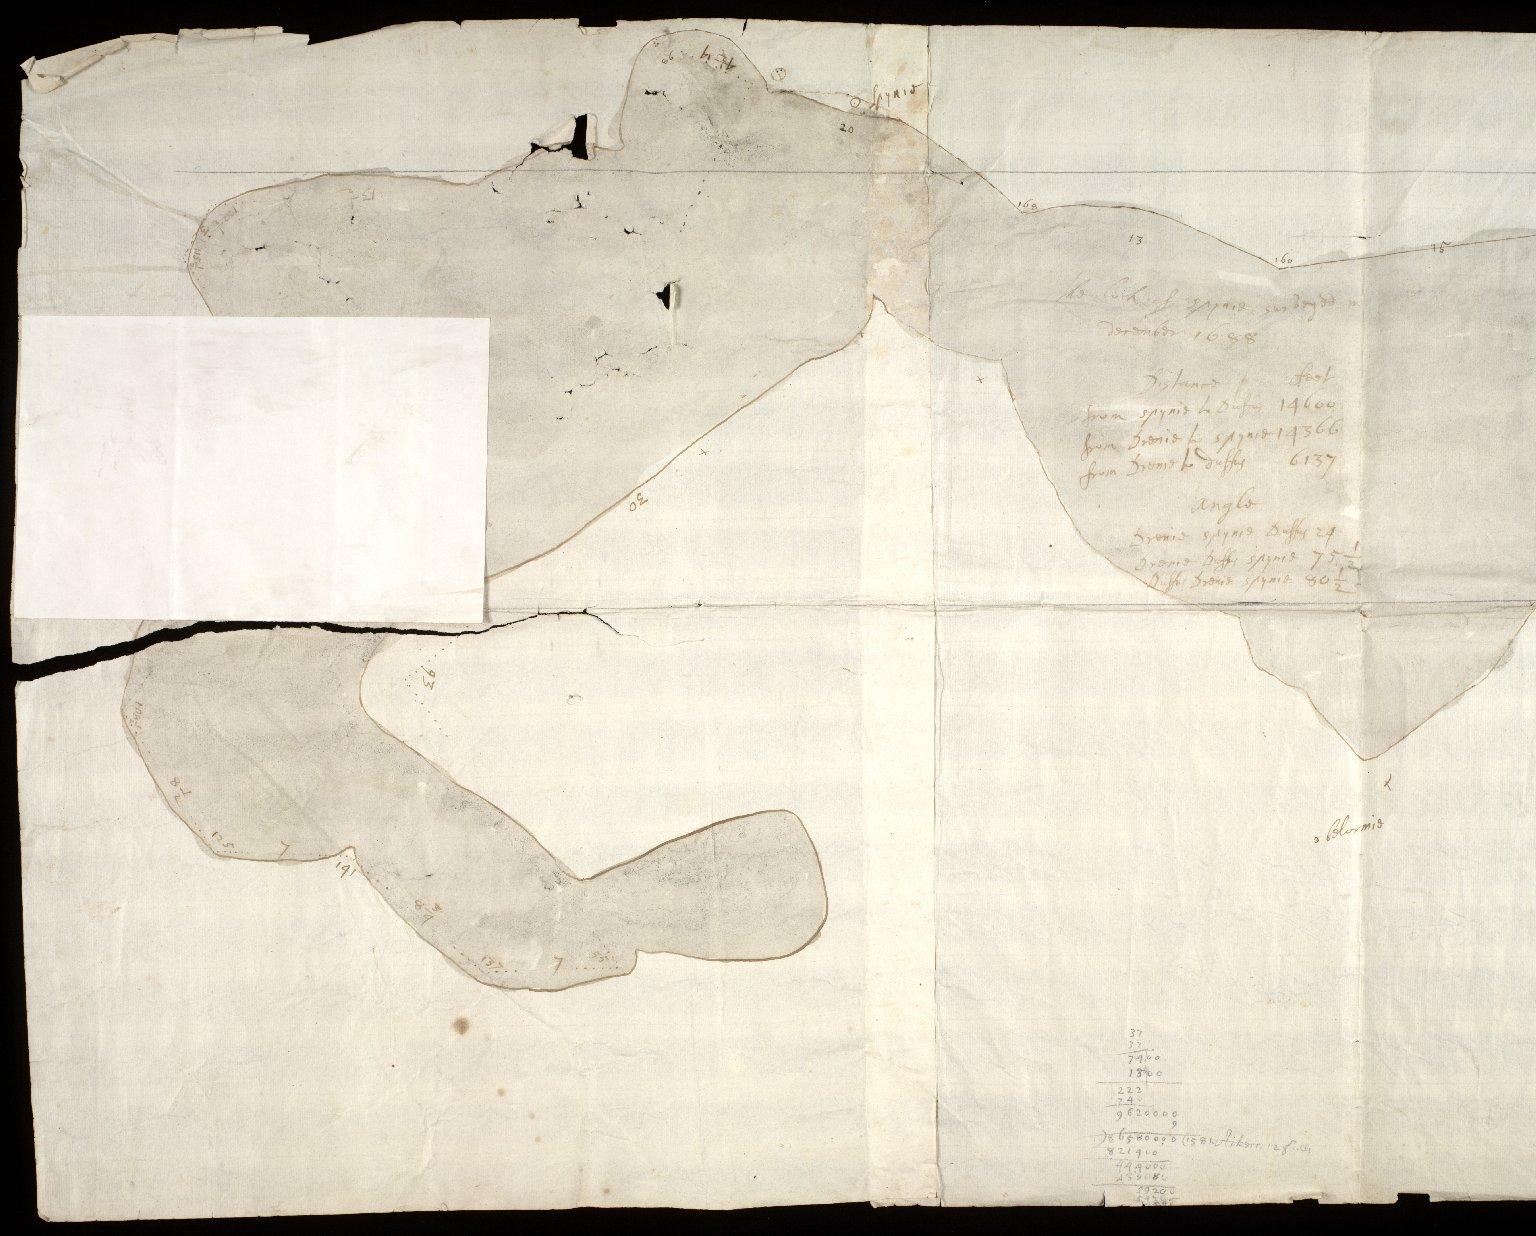 [Sketch of Loch Spynie] [2 of 2]